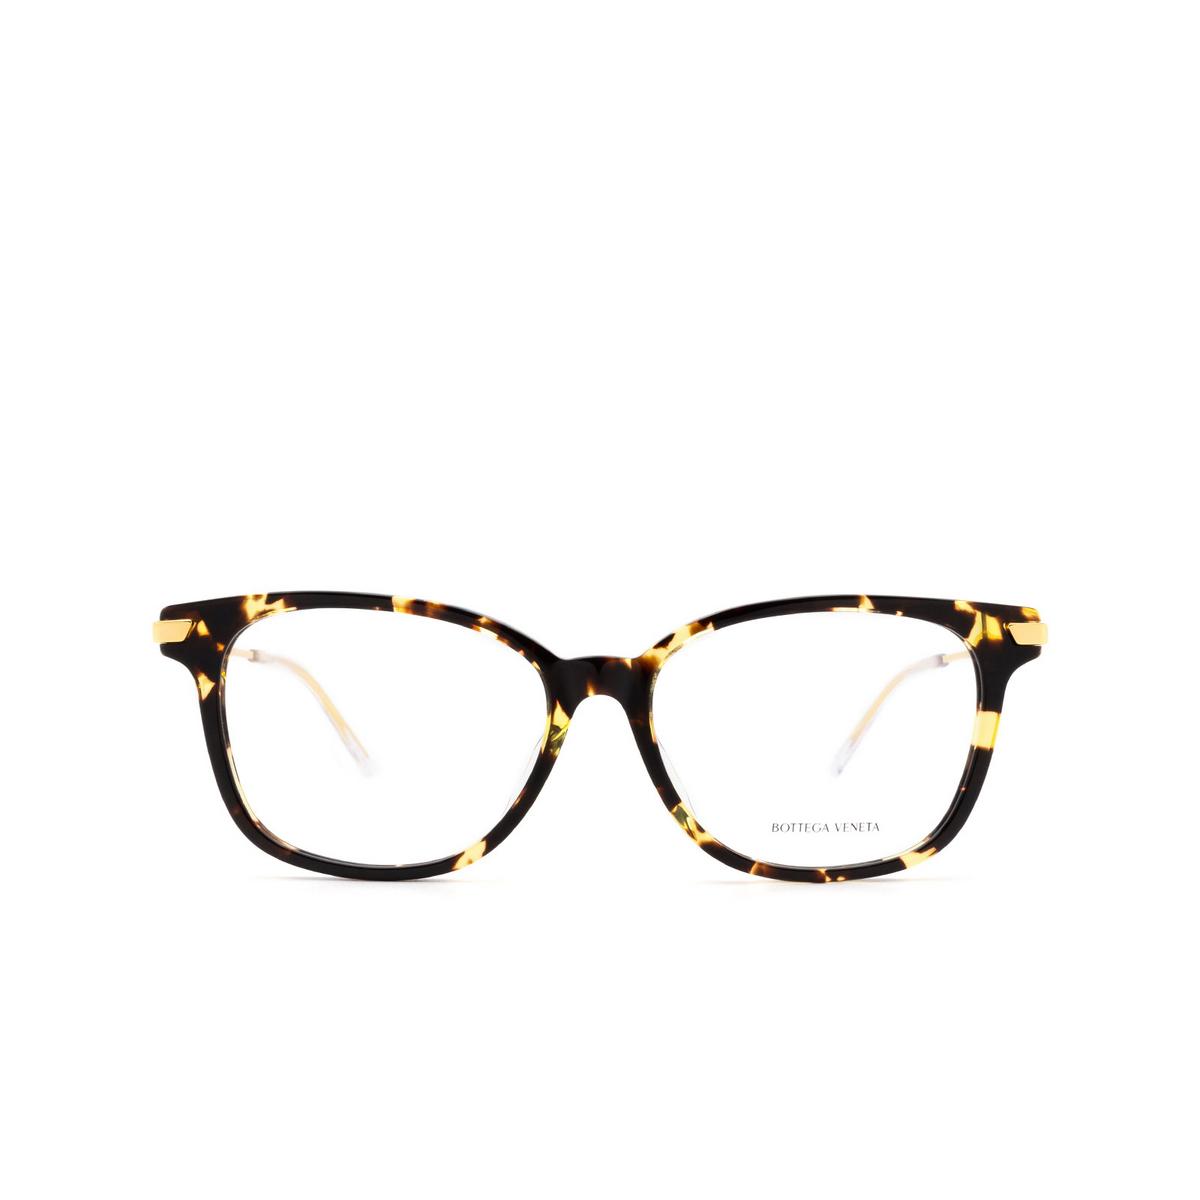 Bottega Veneta® Square Eyeglasses: BV1074OA color Havana 002 - front view.